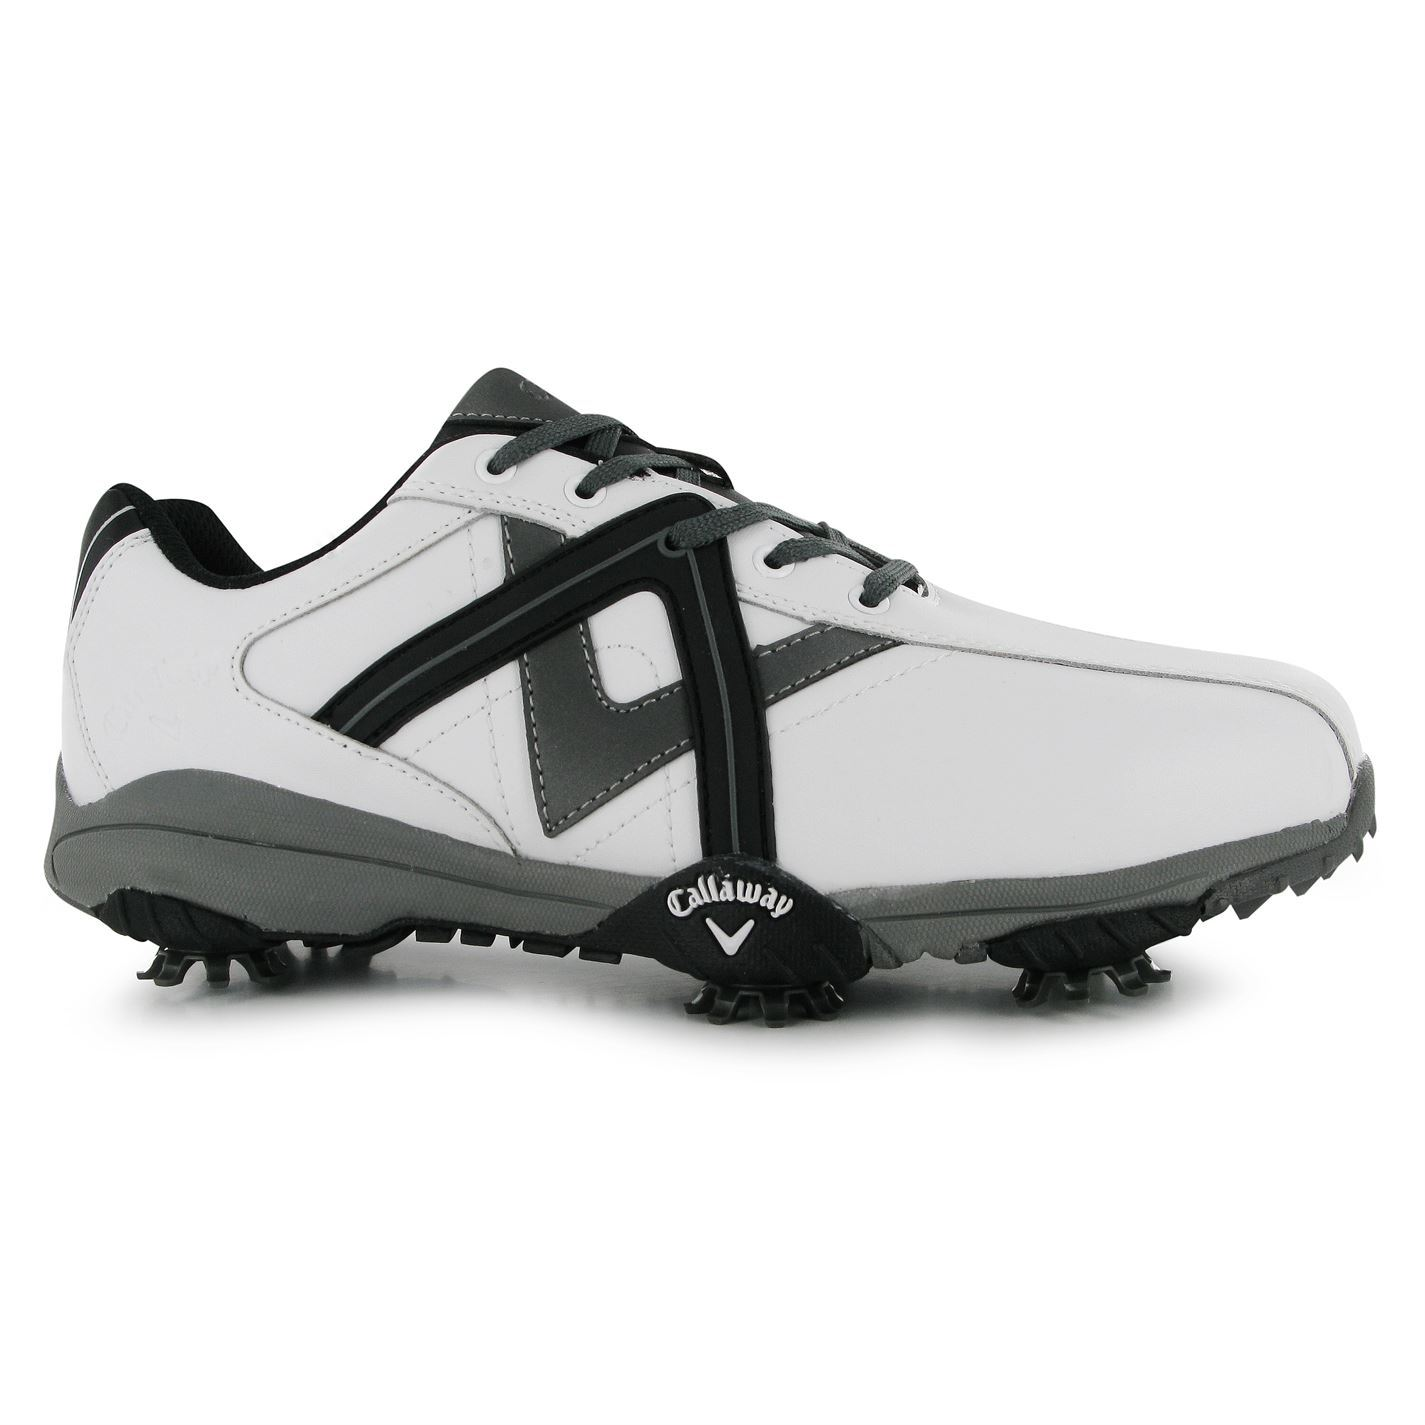 Callaway-Cheviot-ll-Golf-Shoes-Mens-Spikes-Footwear thumbnail 11